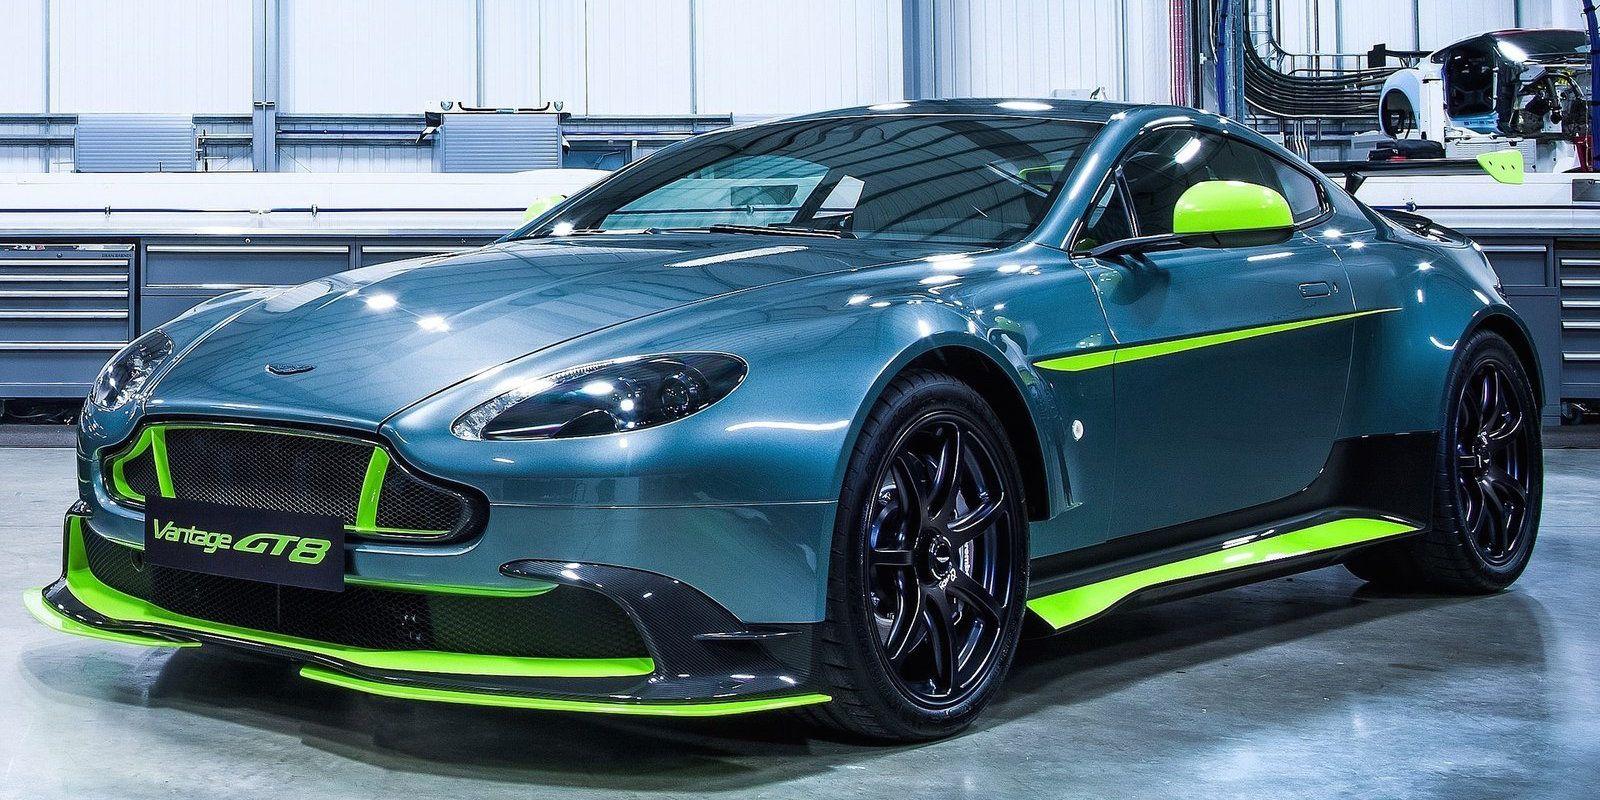 Aston Martin Vantage GT8: A Track-Ready Super-Vantage, Just Not ...